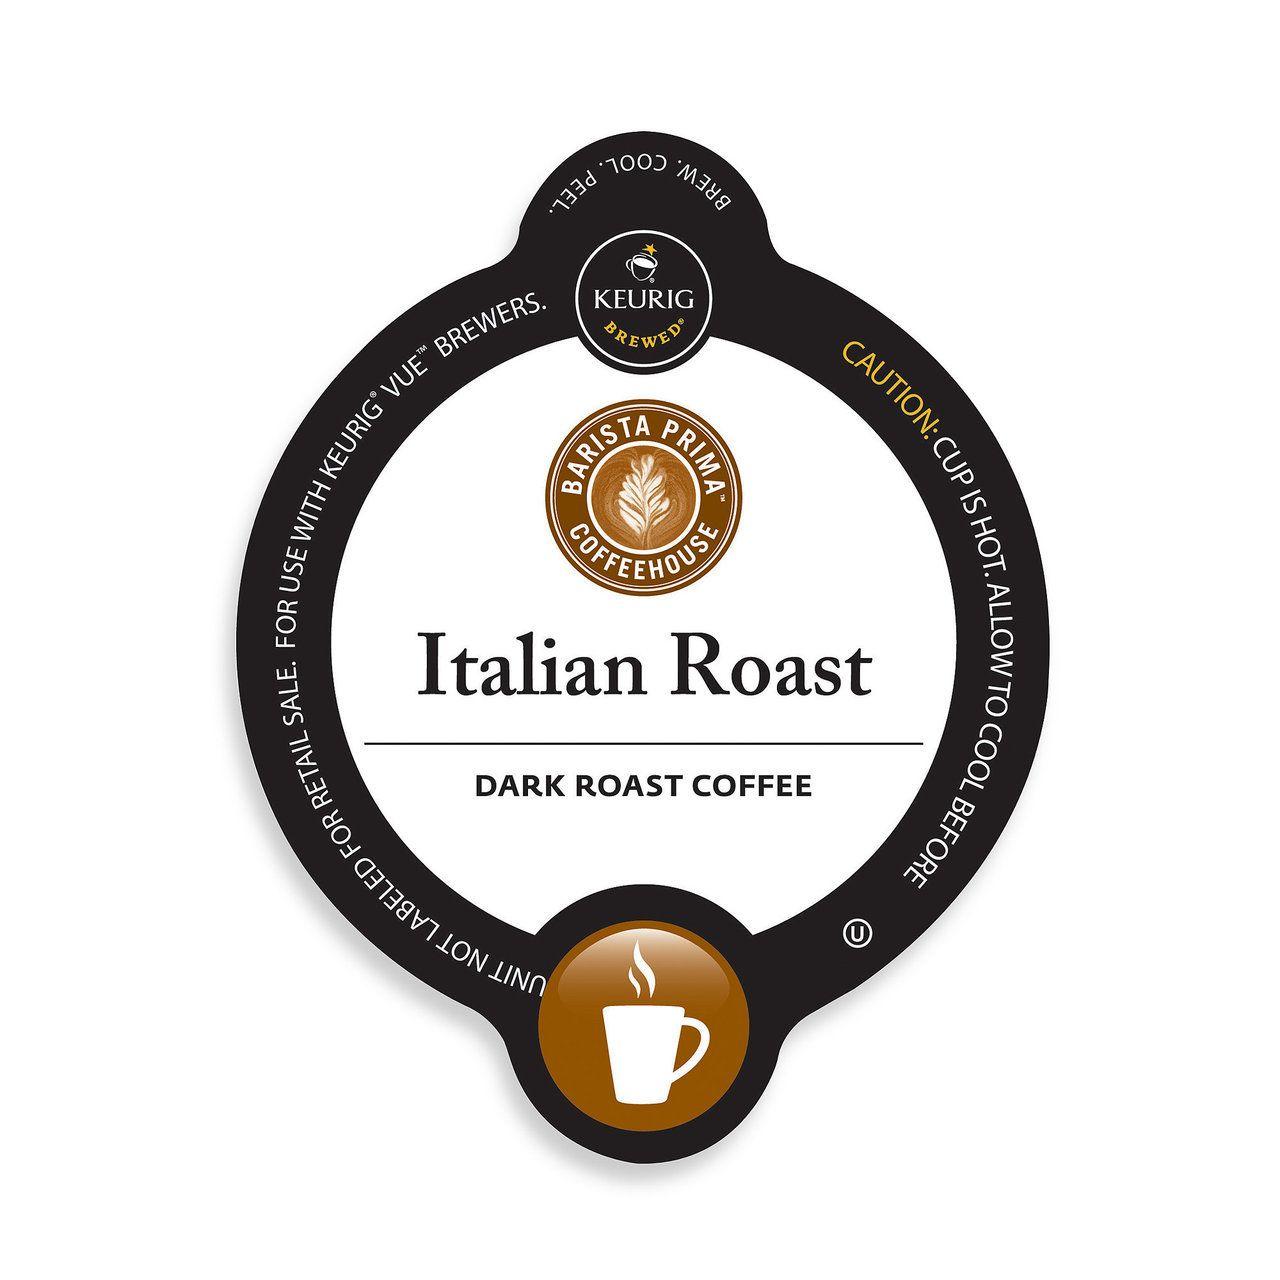 Barista primahouse italian roast coffee kcup portion